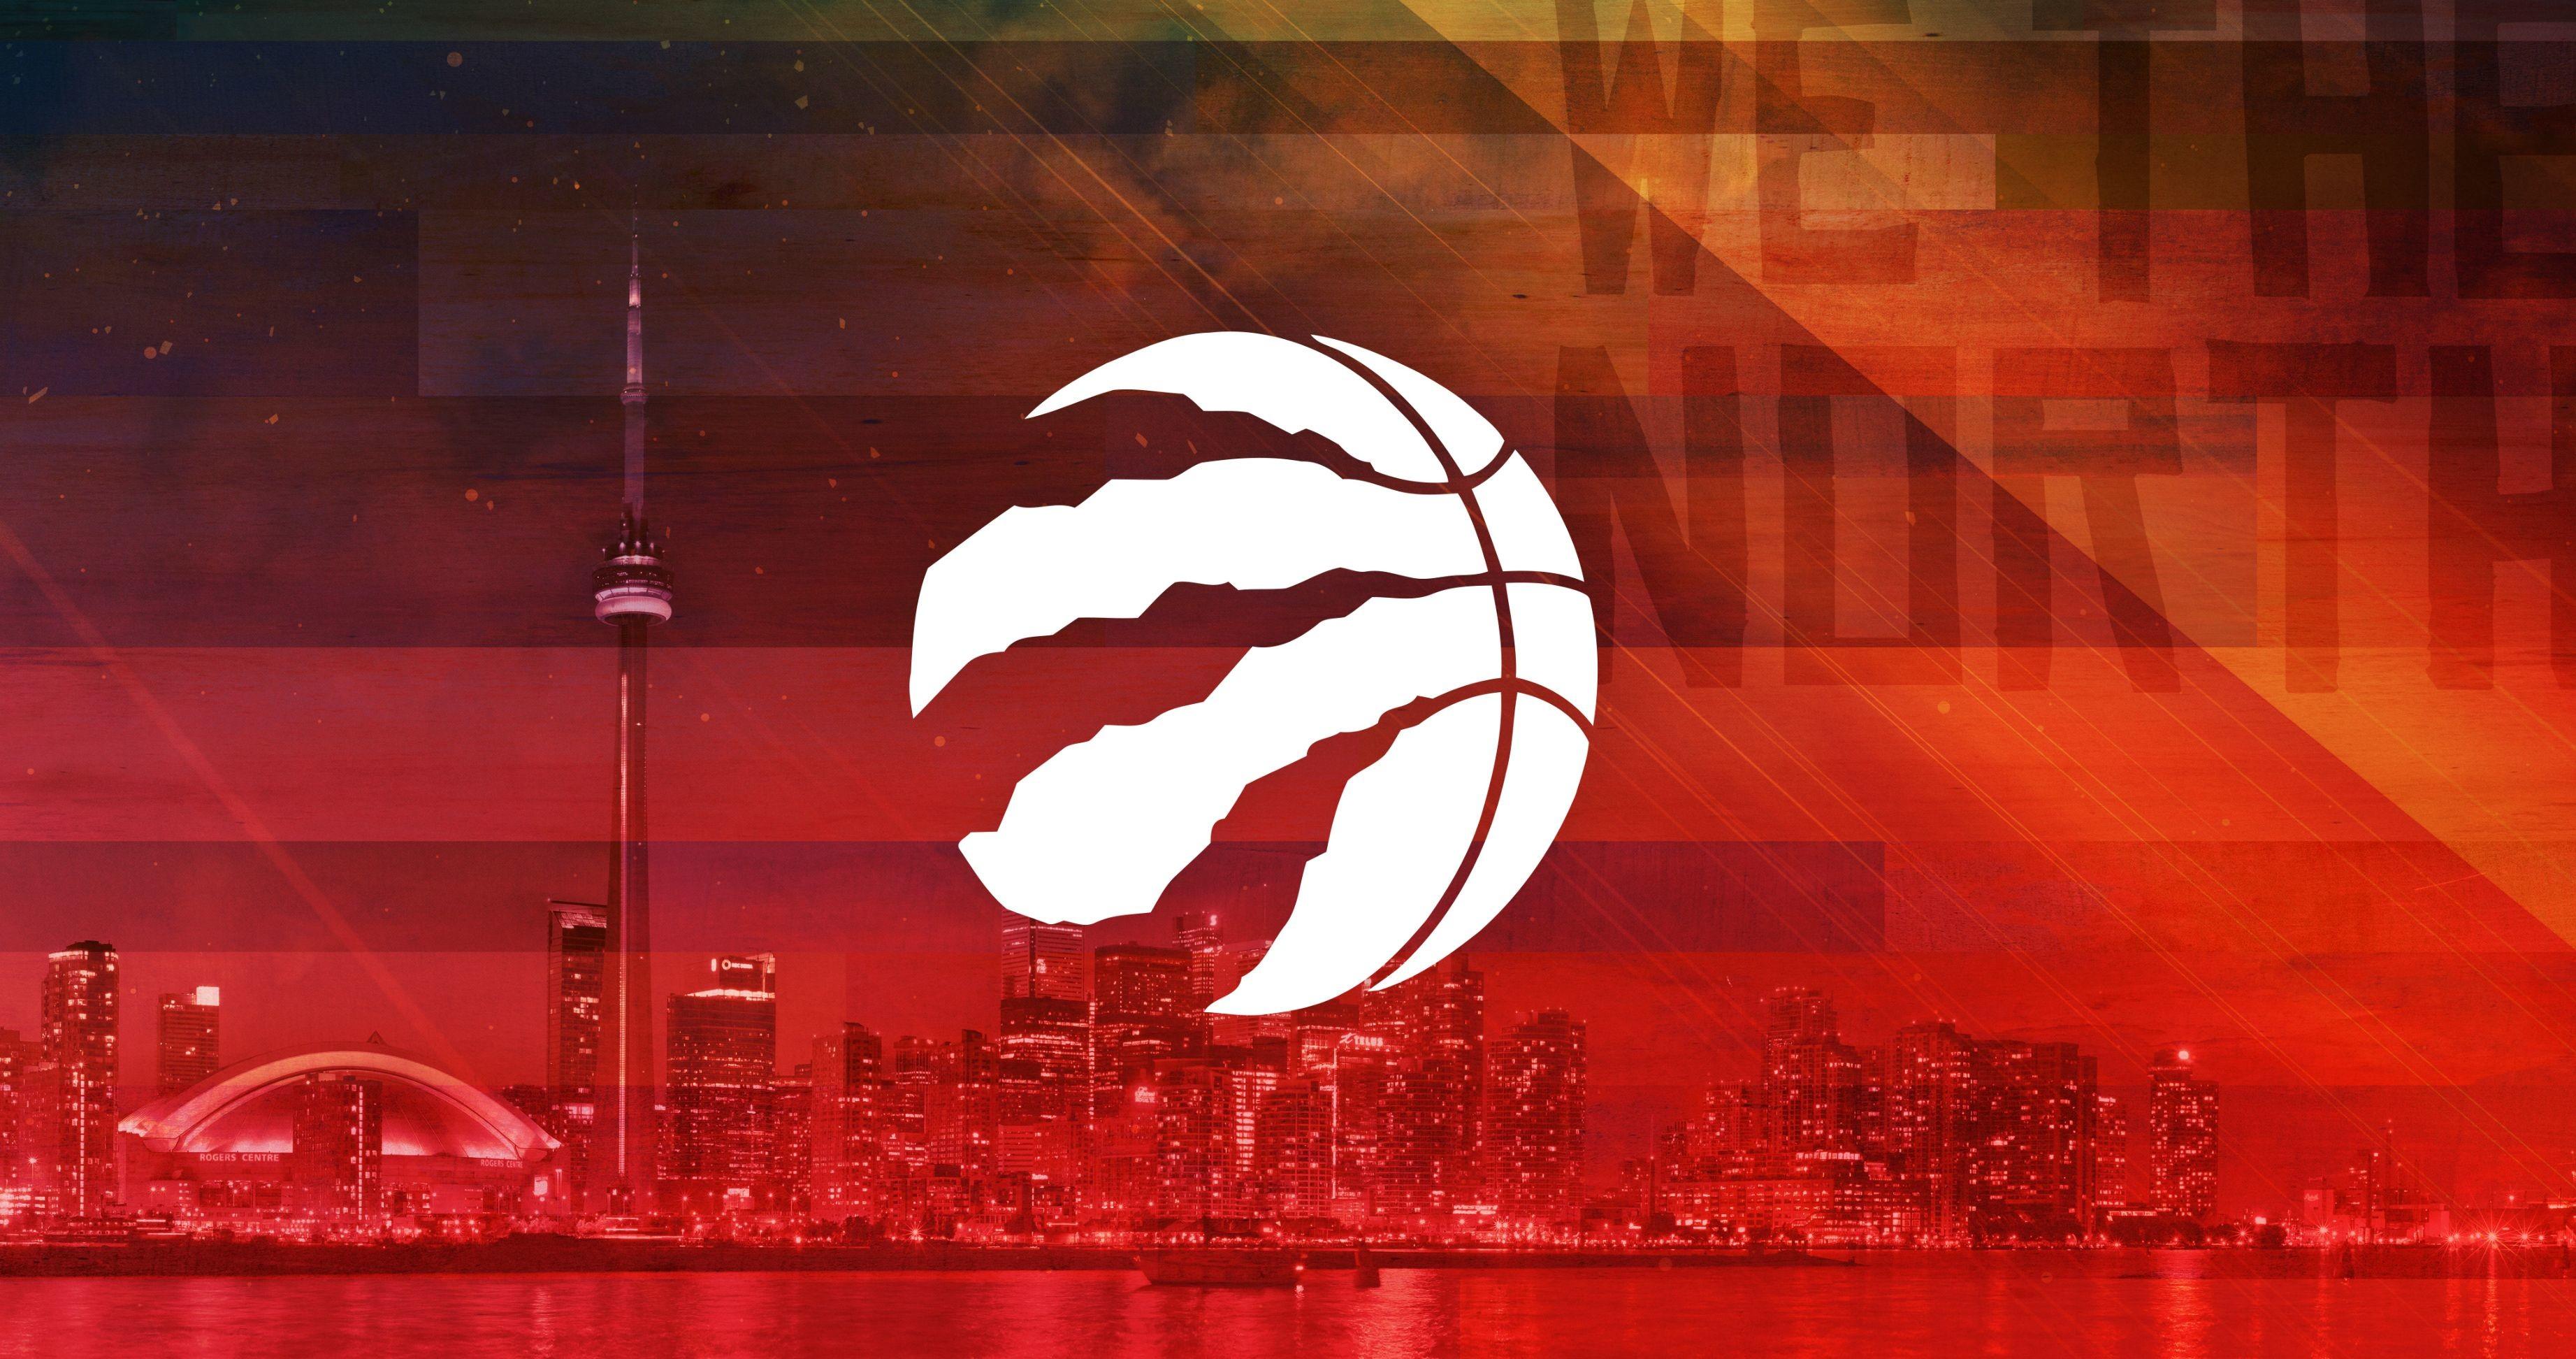 Toronto Raptors Nba Champions Wallpapers: Toronto Raptors Wallpapers ·① WallpaperTag